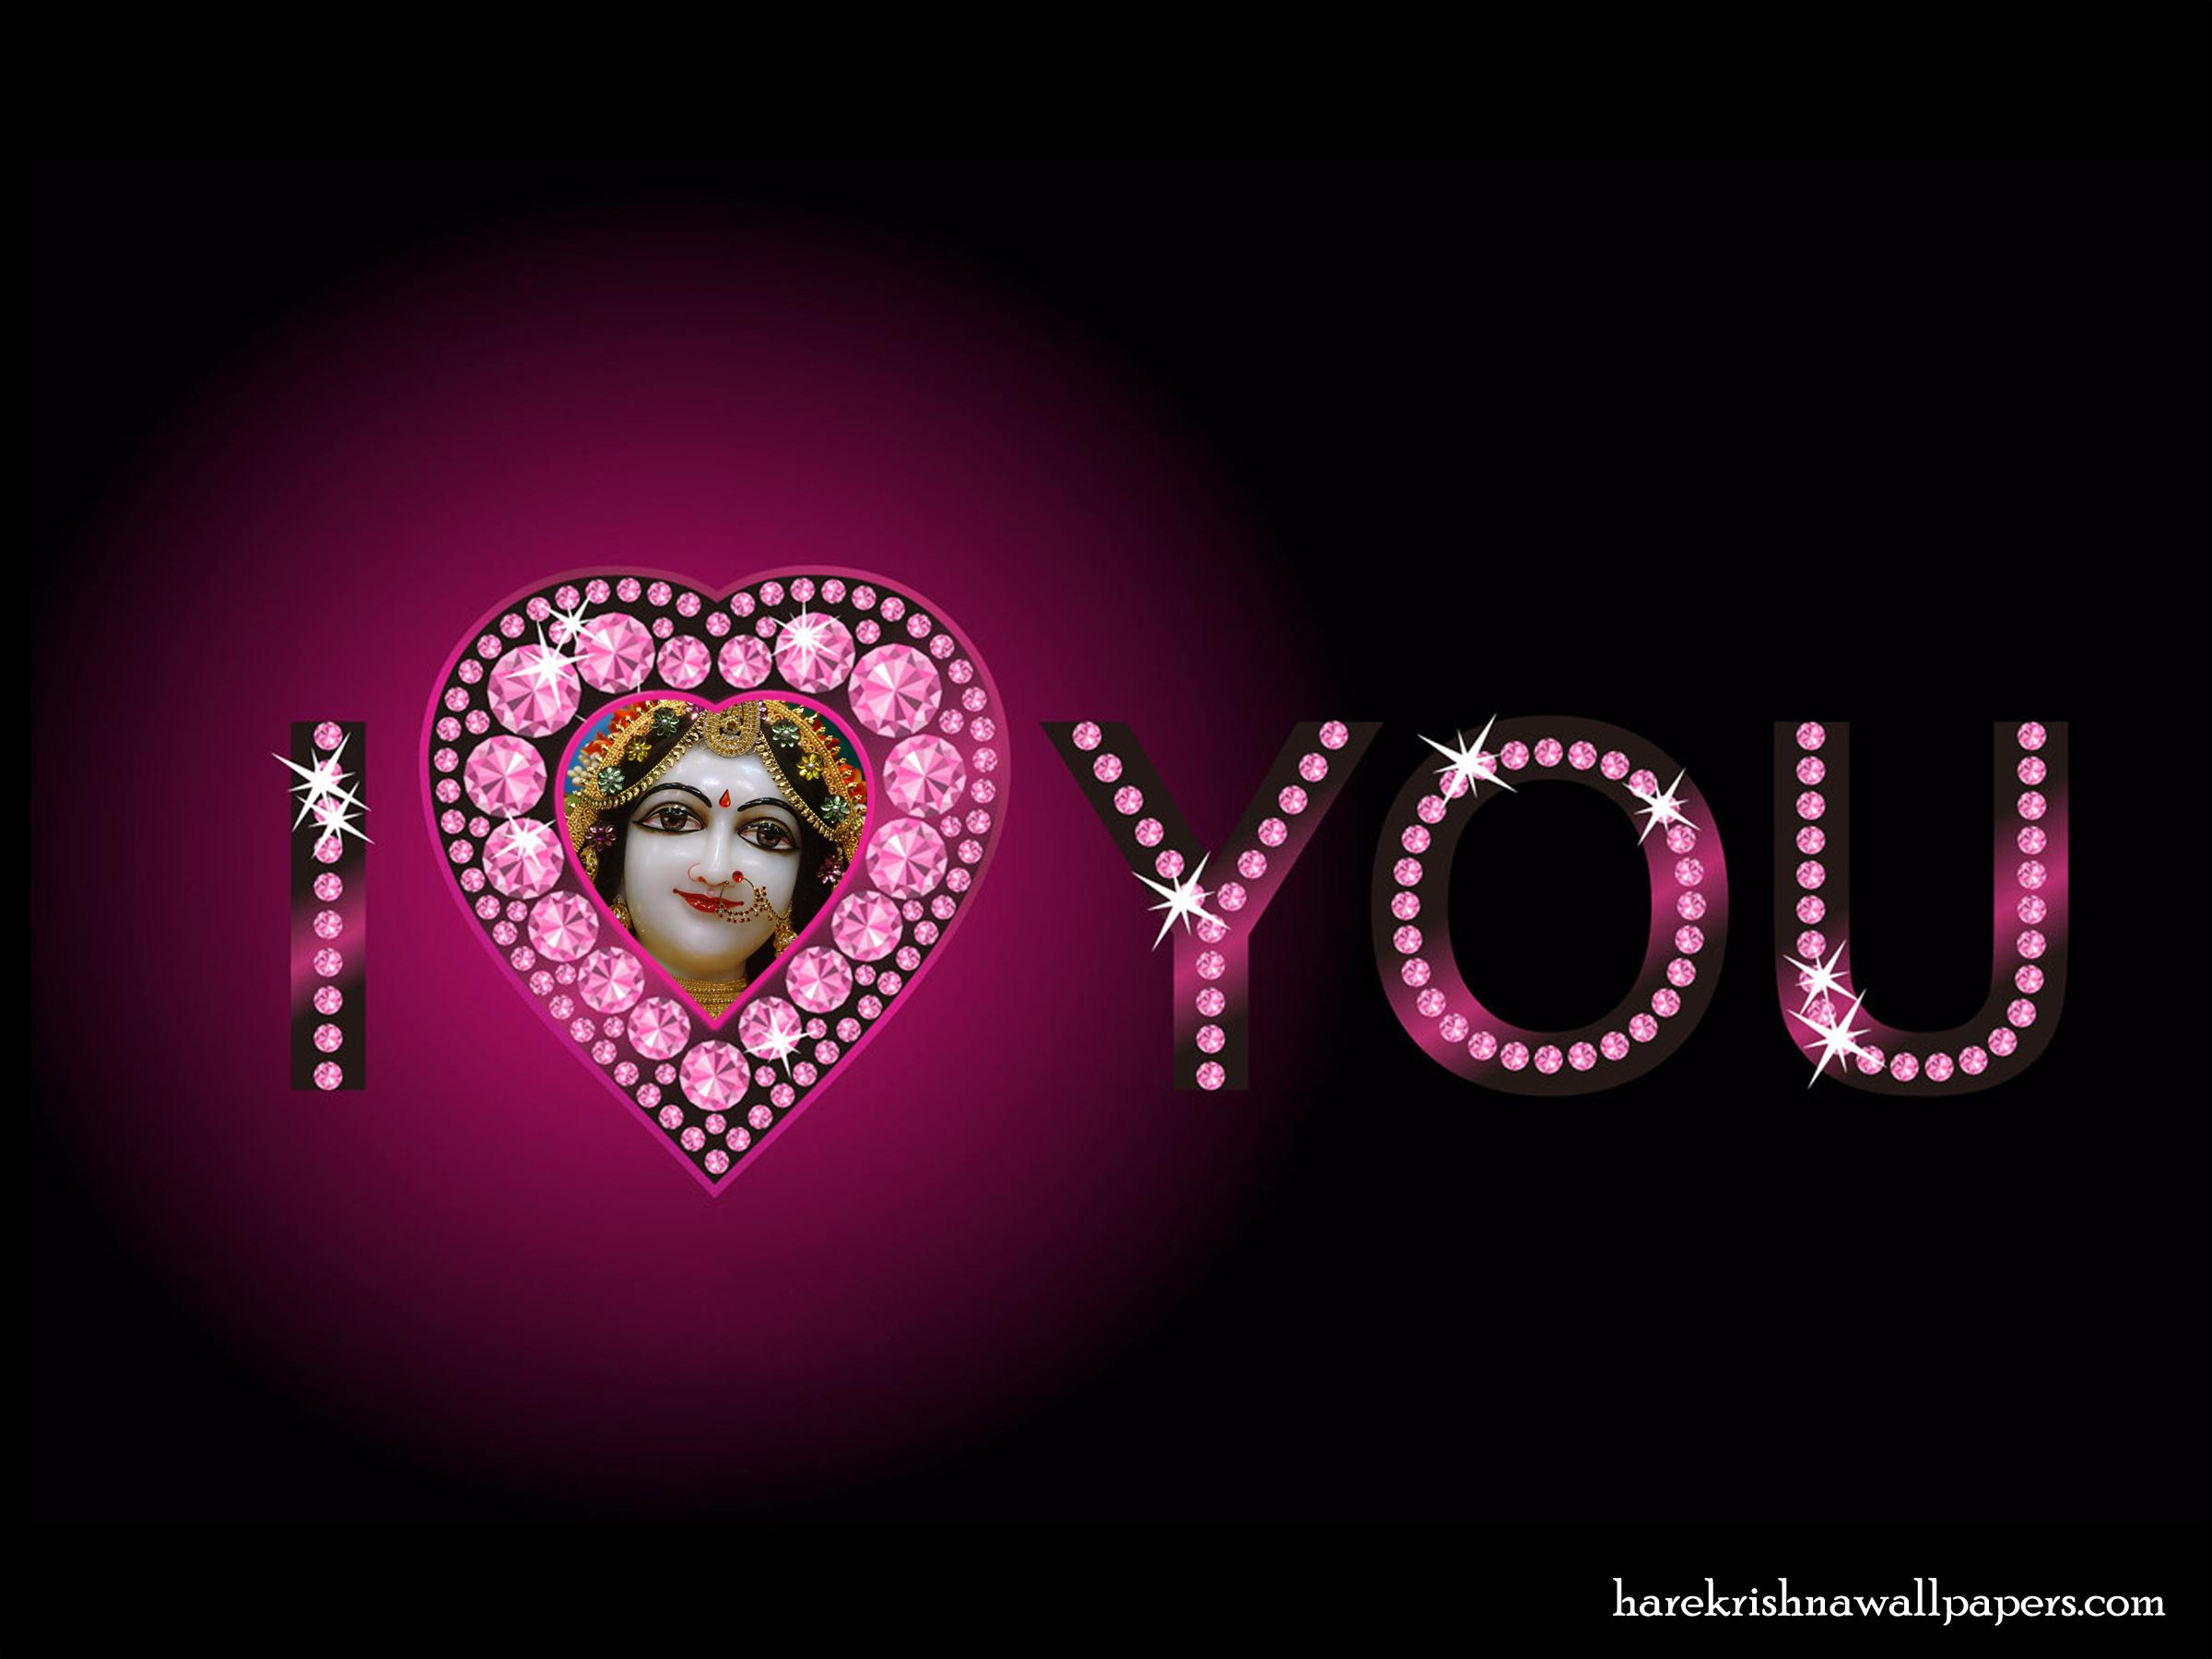 I Love You Radharani Wallpaper (012) Size 2400x1800 Download